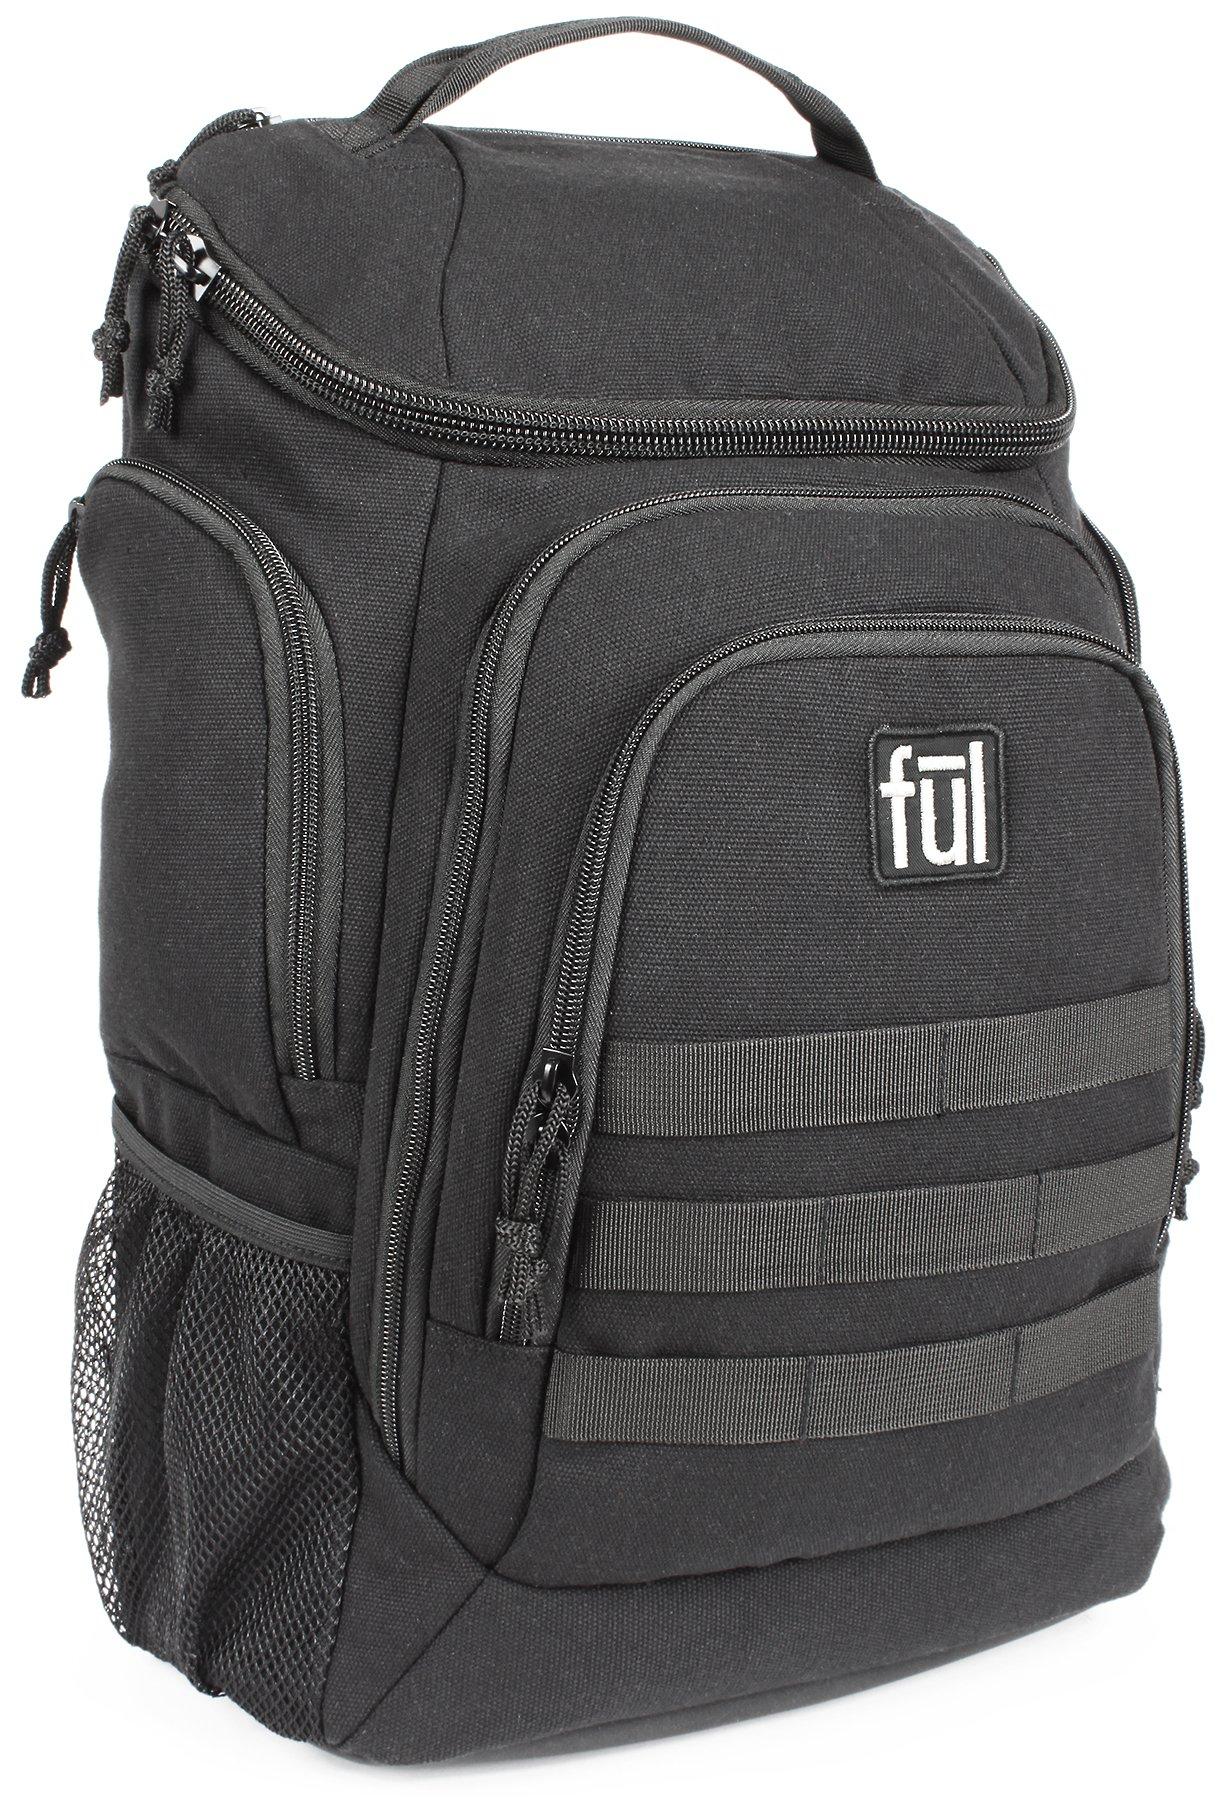 Ful Elite Tactical Laptop Backpack, Fits Laptops up to 17'', Black